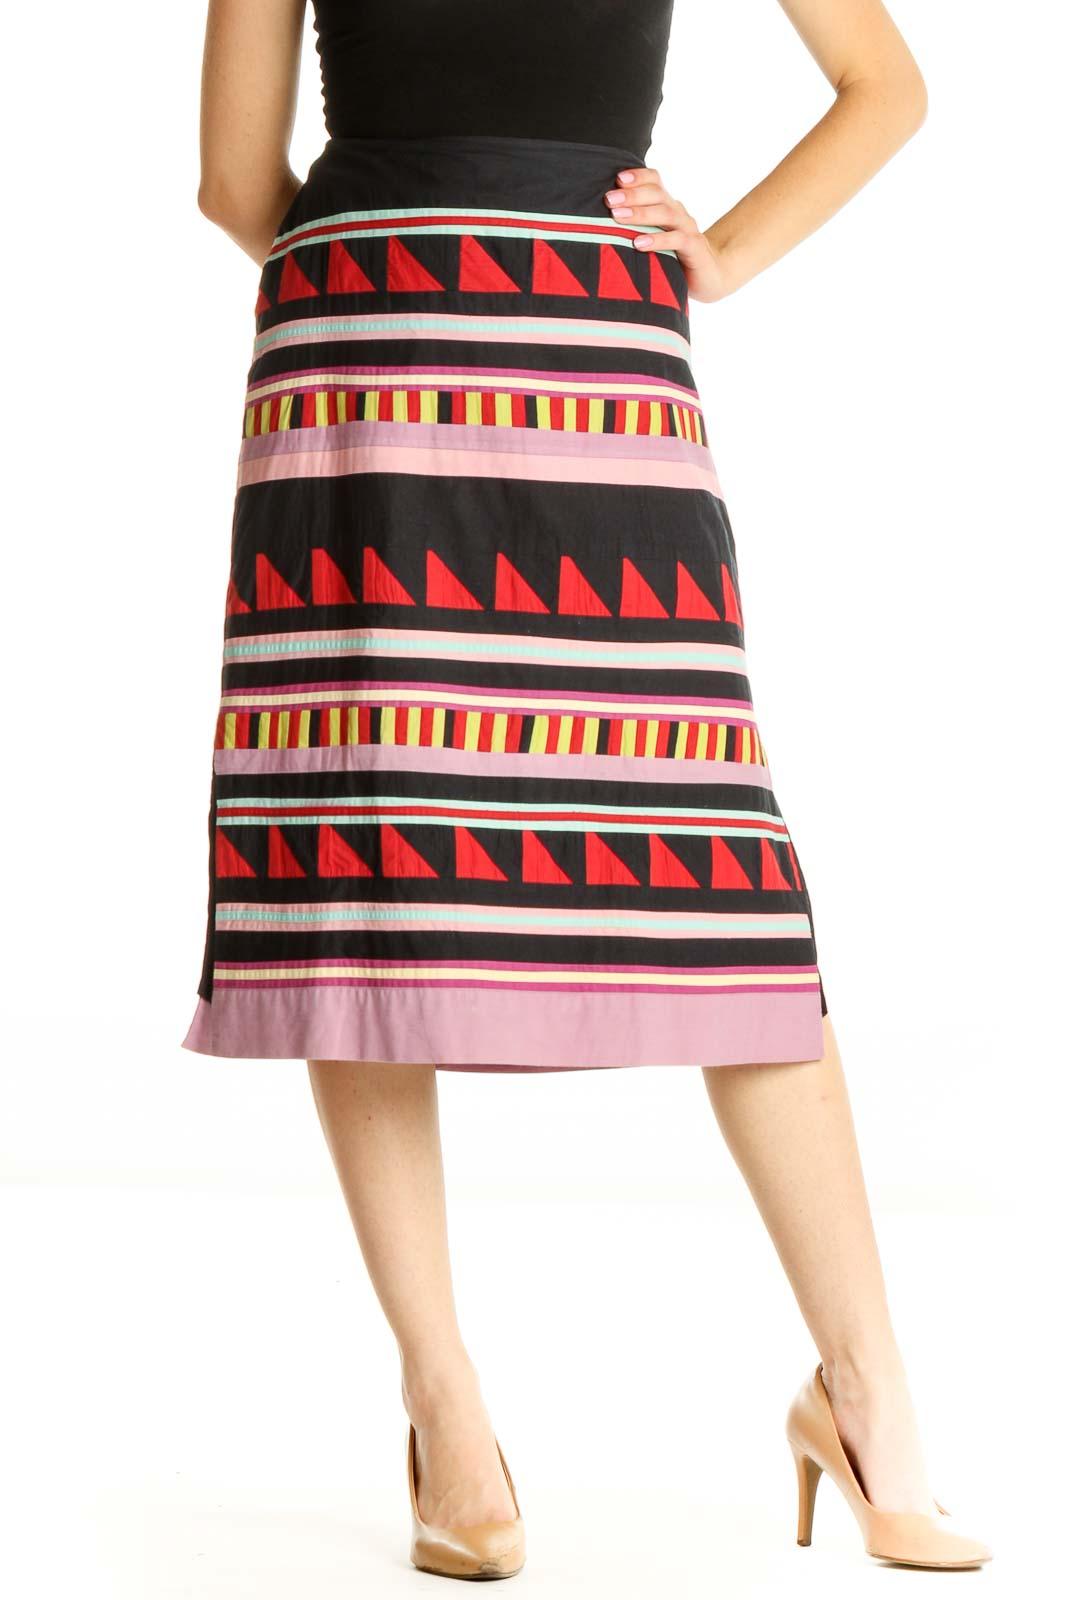 Black Aztec Print Bohemian A-Line Skirt Front